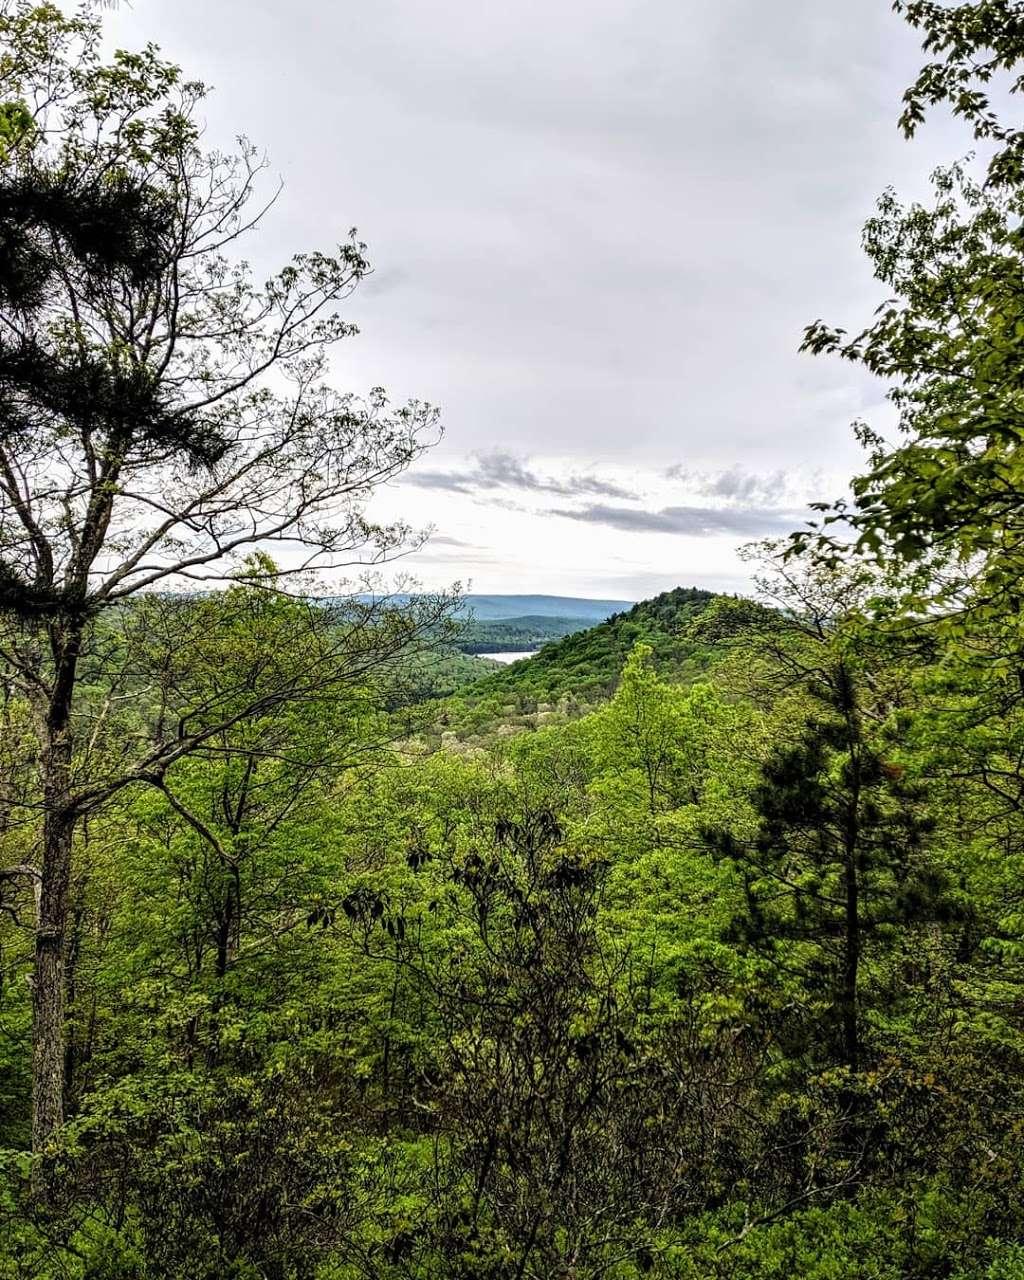 Rocky Knob Trail Head - park  | Photo 1 of 10 | Address: Ridge Rd, Shippensburg, PA 17257, USA | Phone: (717) 352-2211